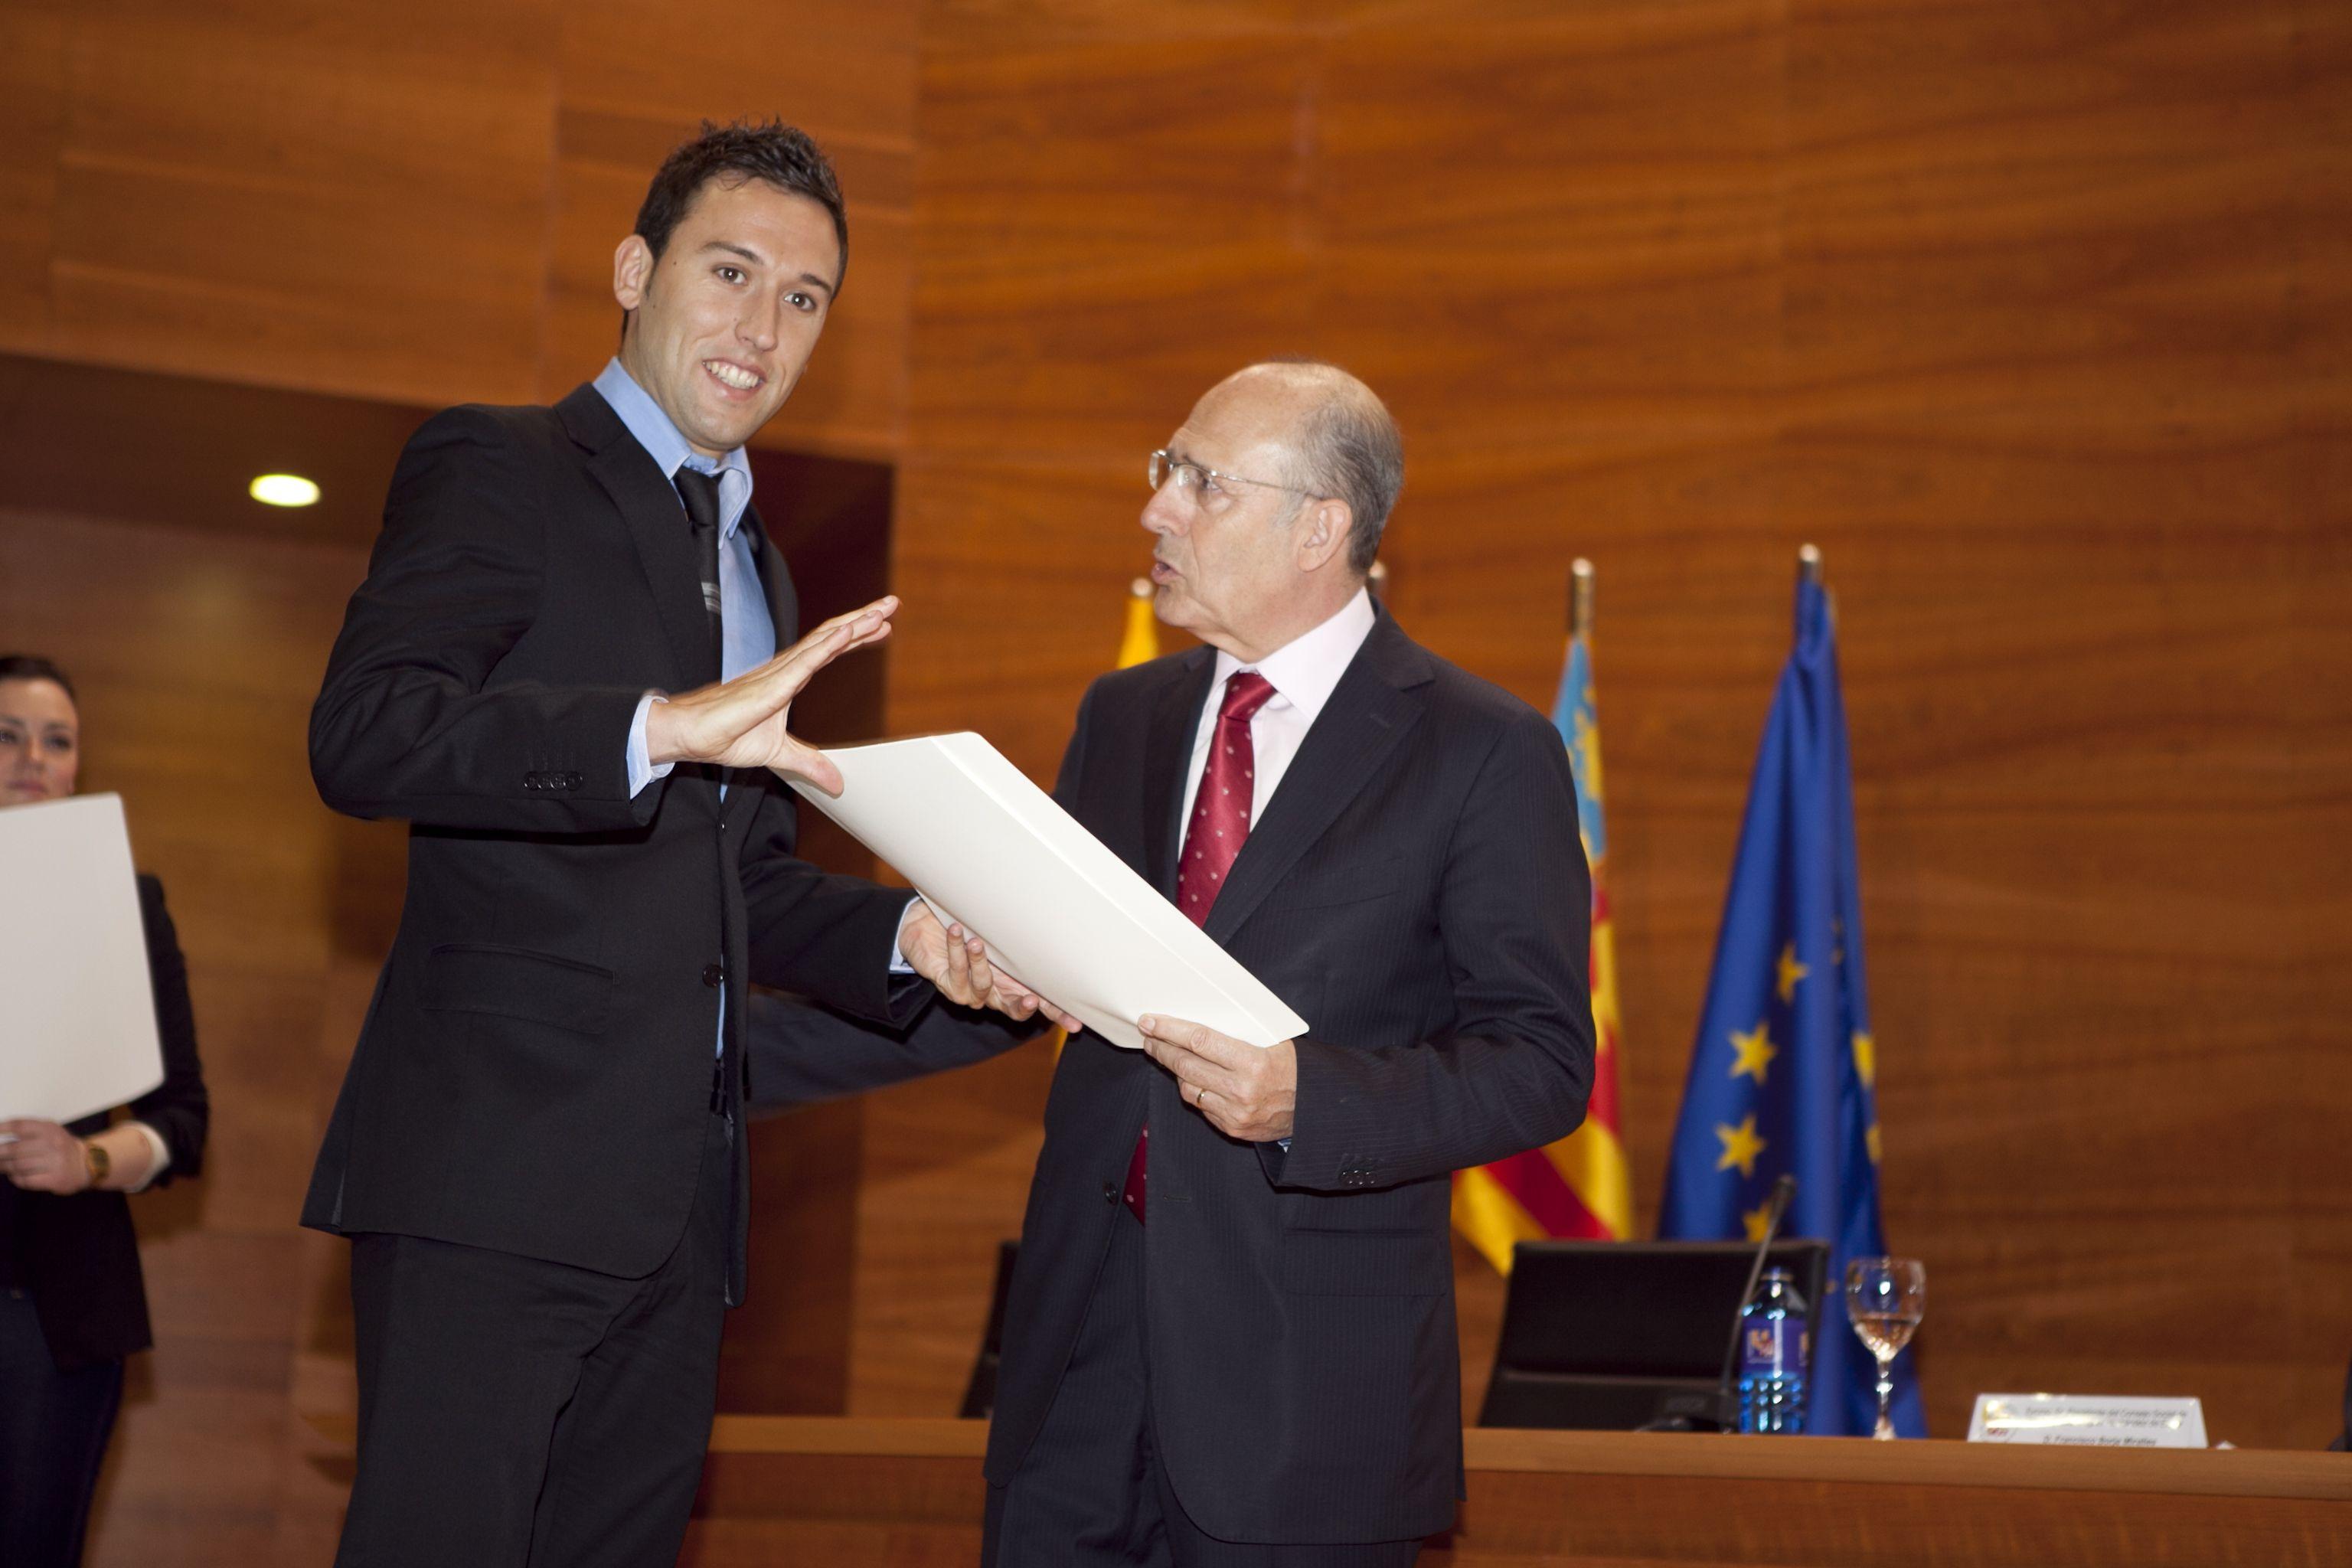 umh-diplomas-rector_mg_6722.jpg